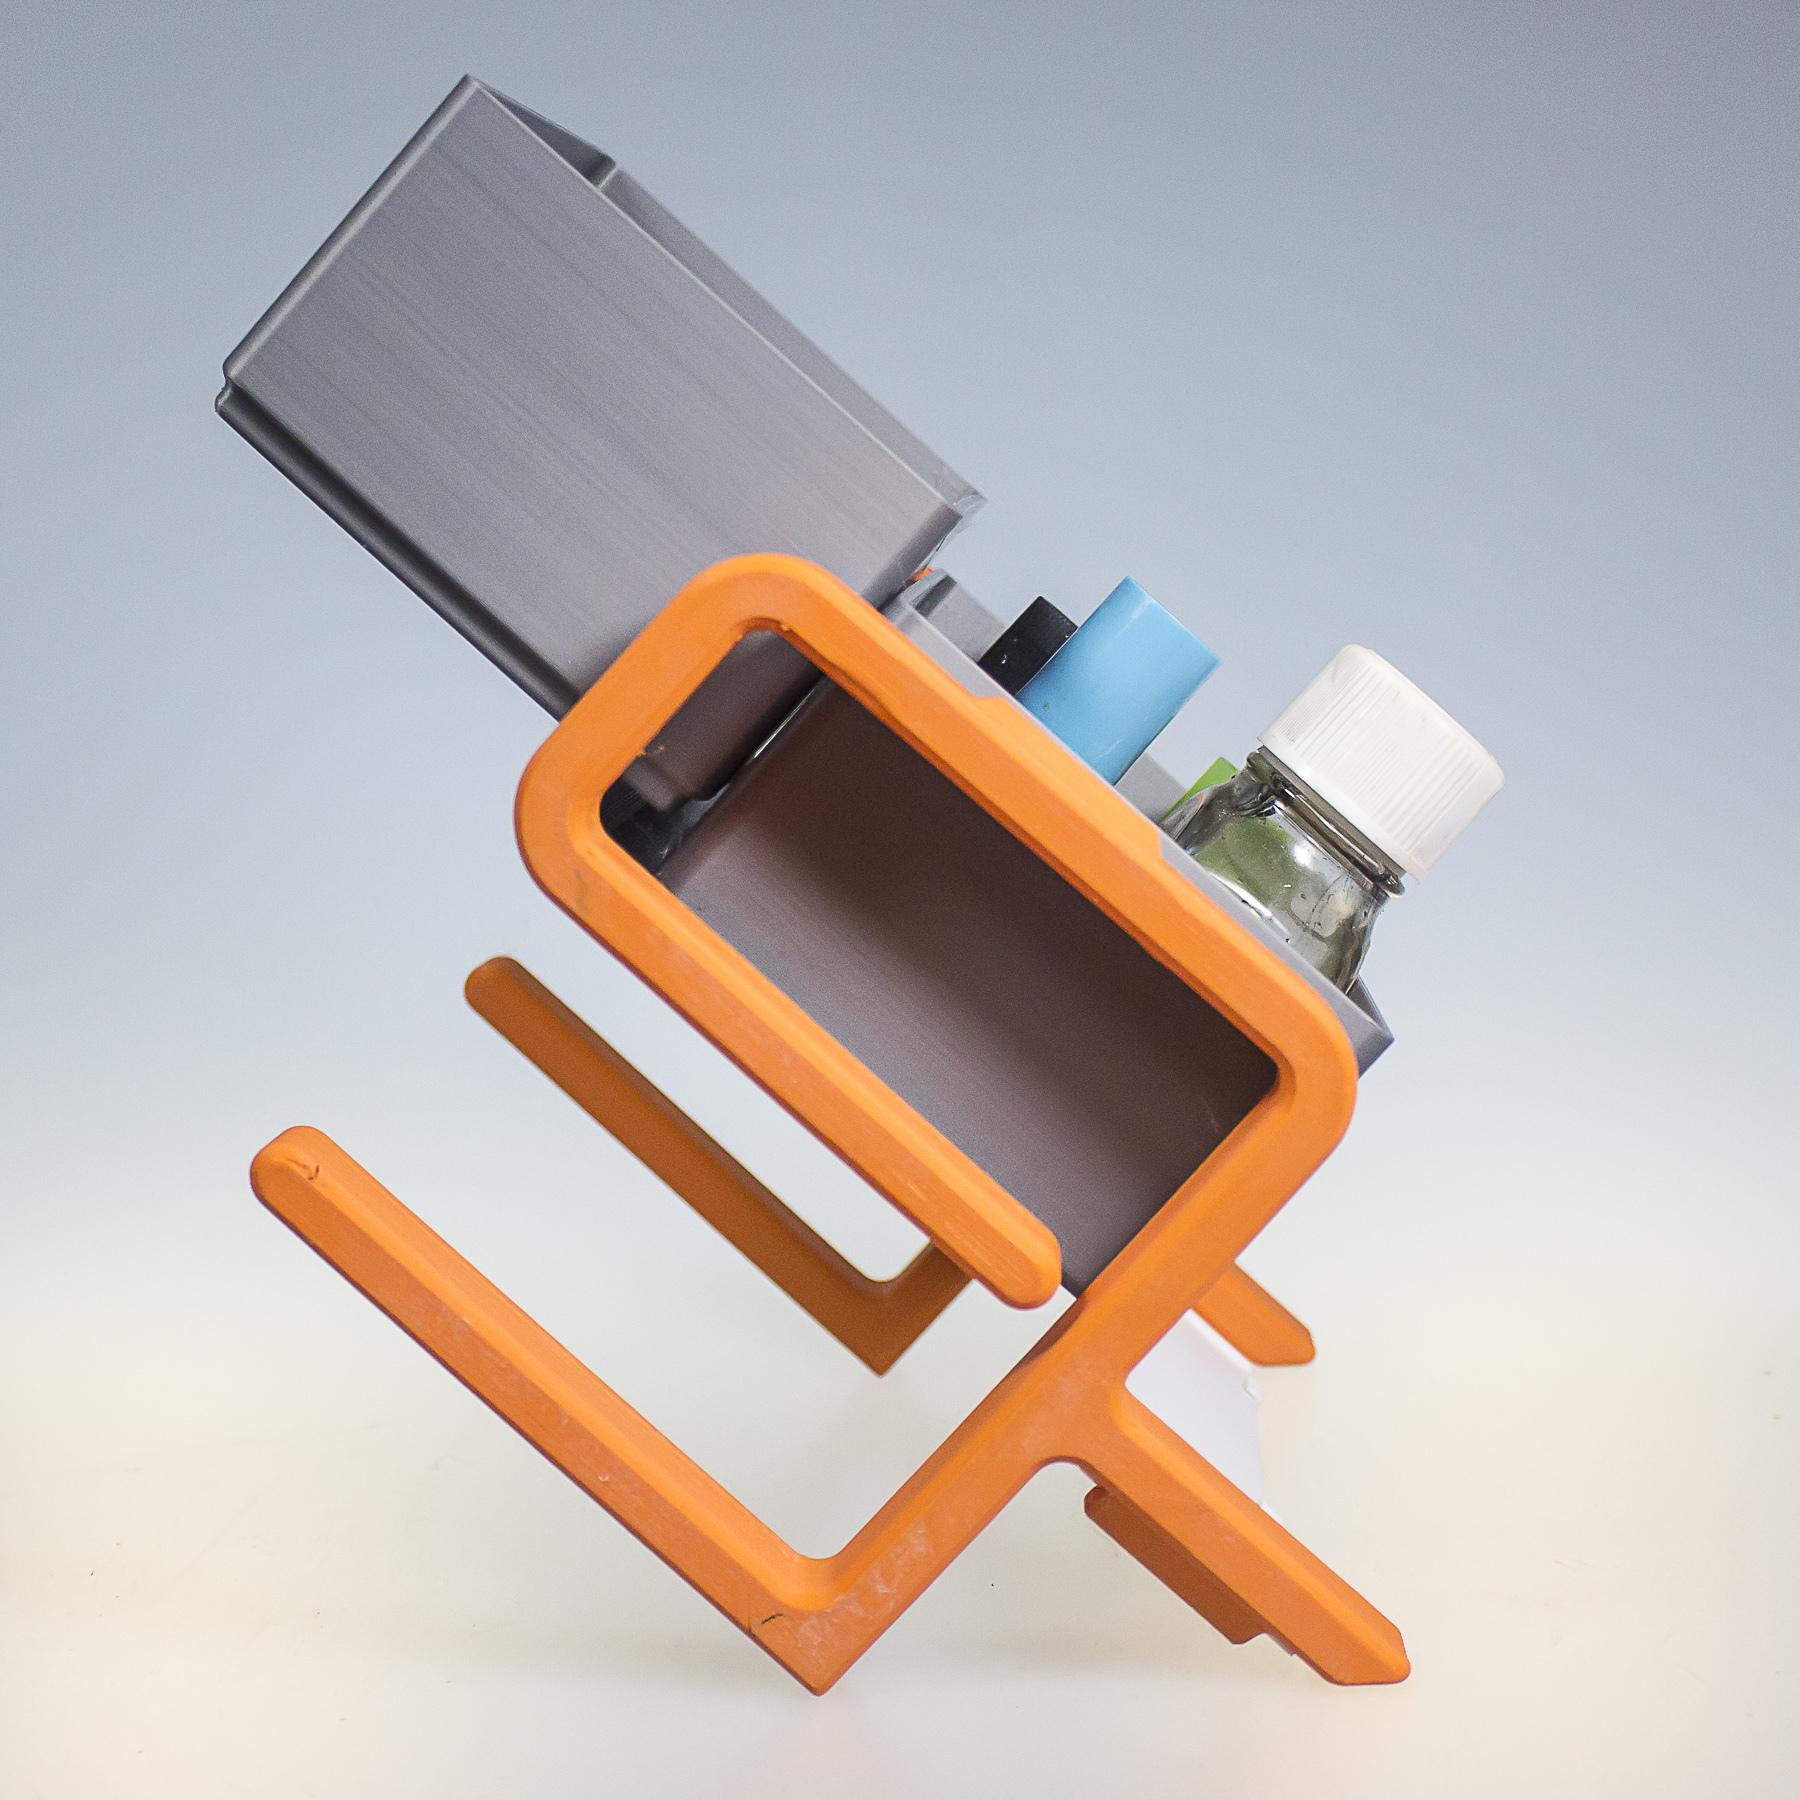 _MG_2012.jpg Download STL file Inkynato • 3D print design, CKLab